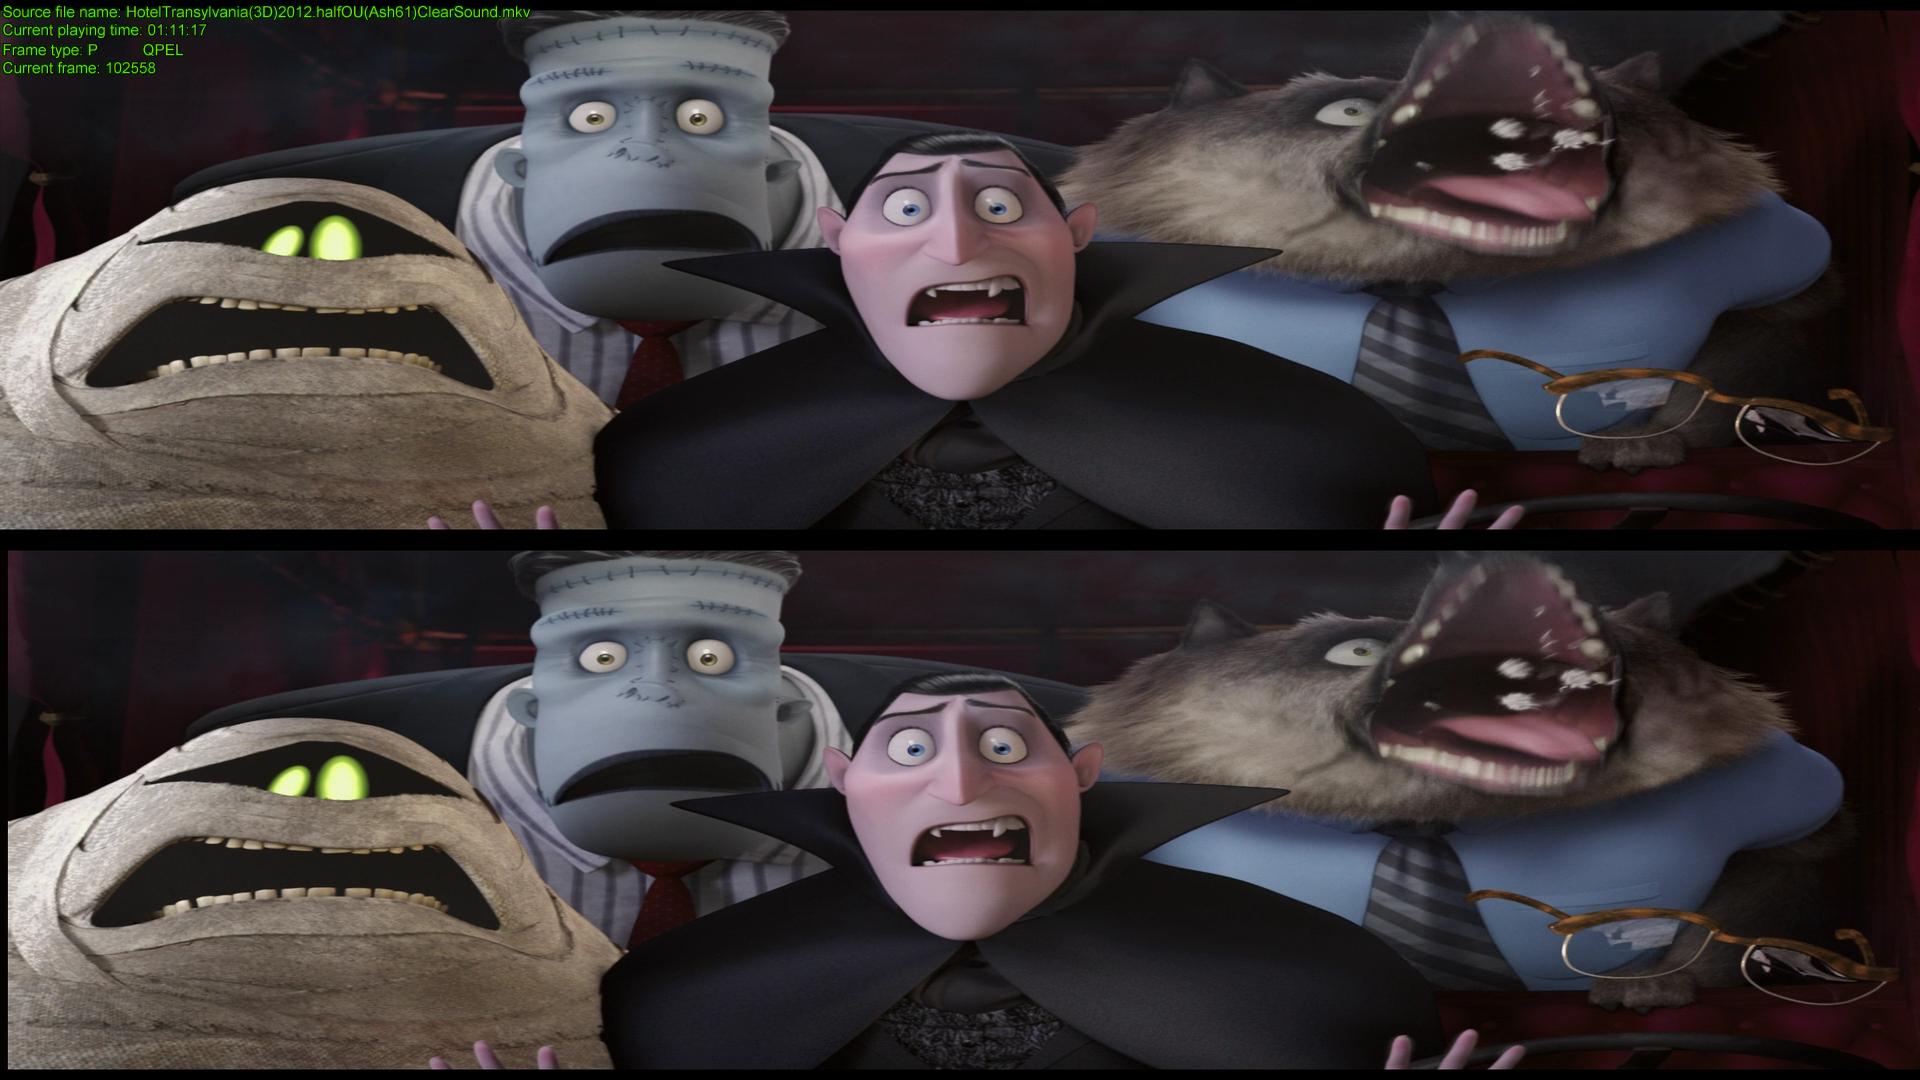 Мoнстры на кaникулах в 3Д / Hоtel Trаnsylvania 3D (2012) BDRip 1080p